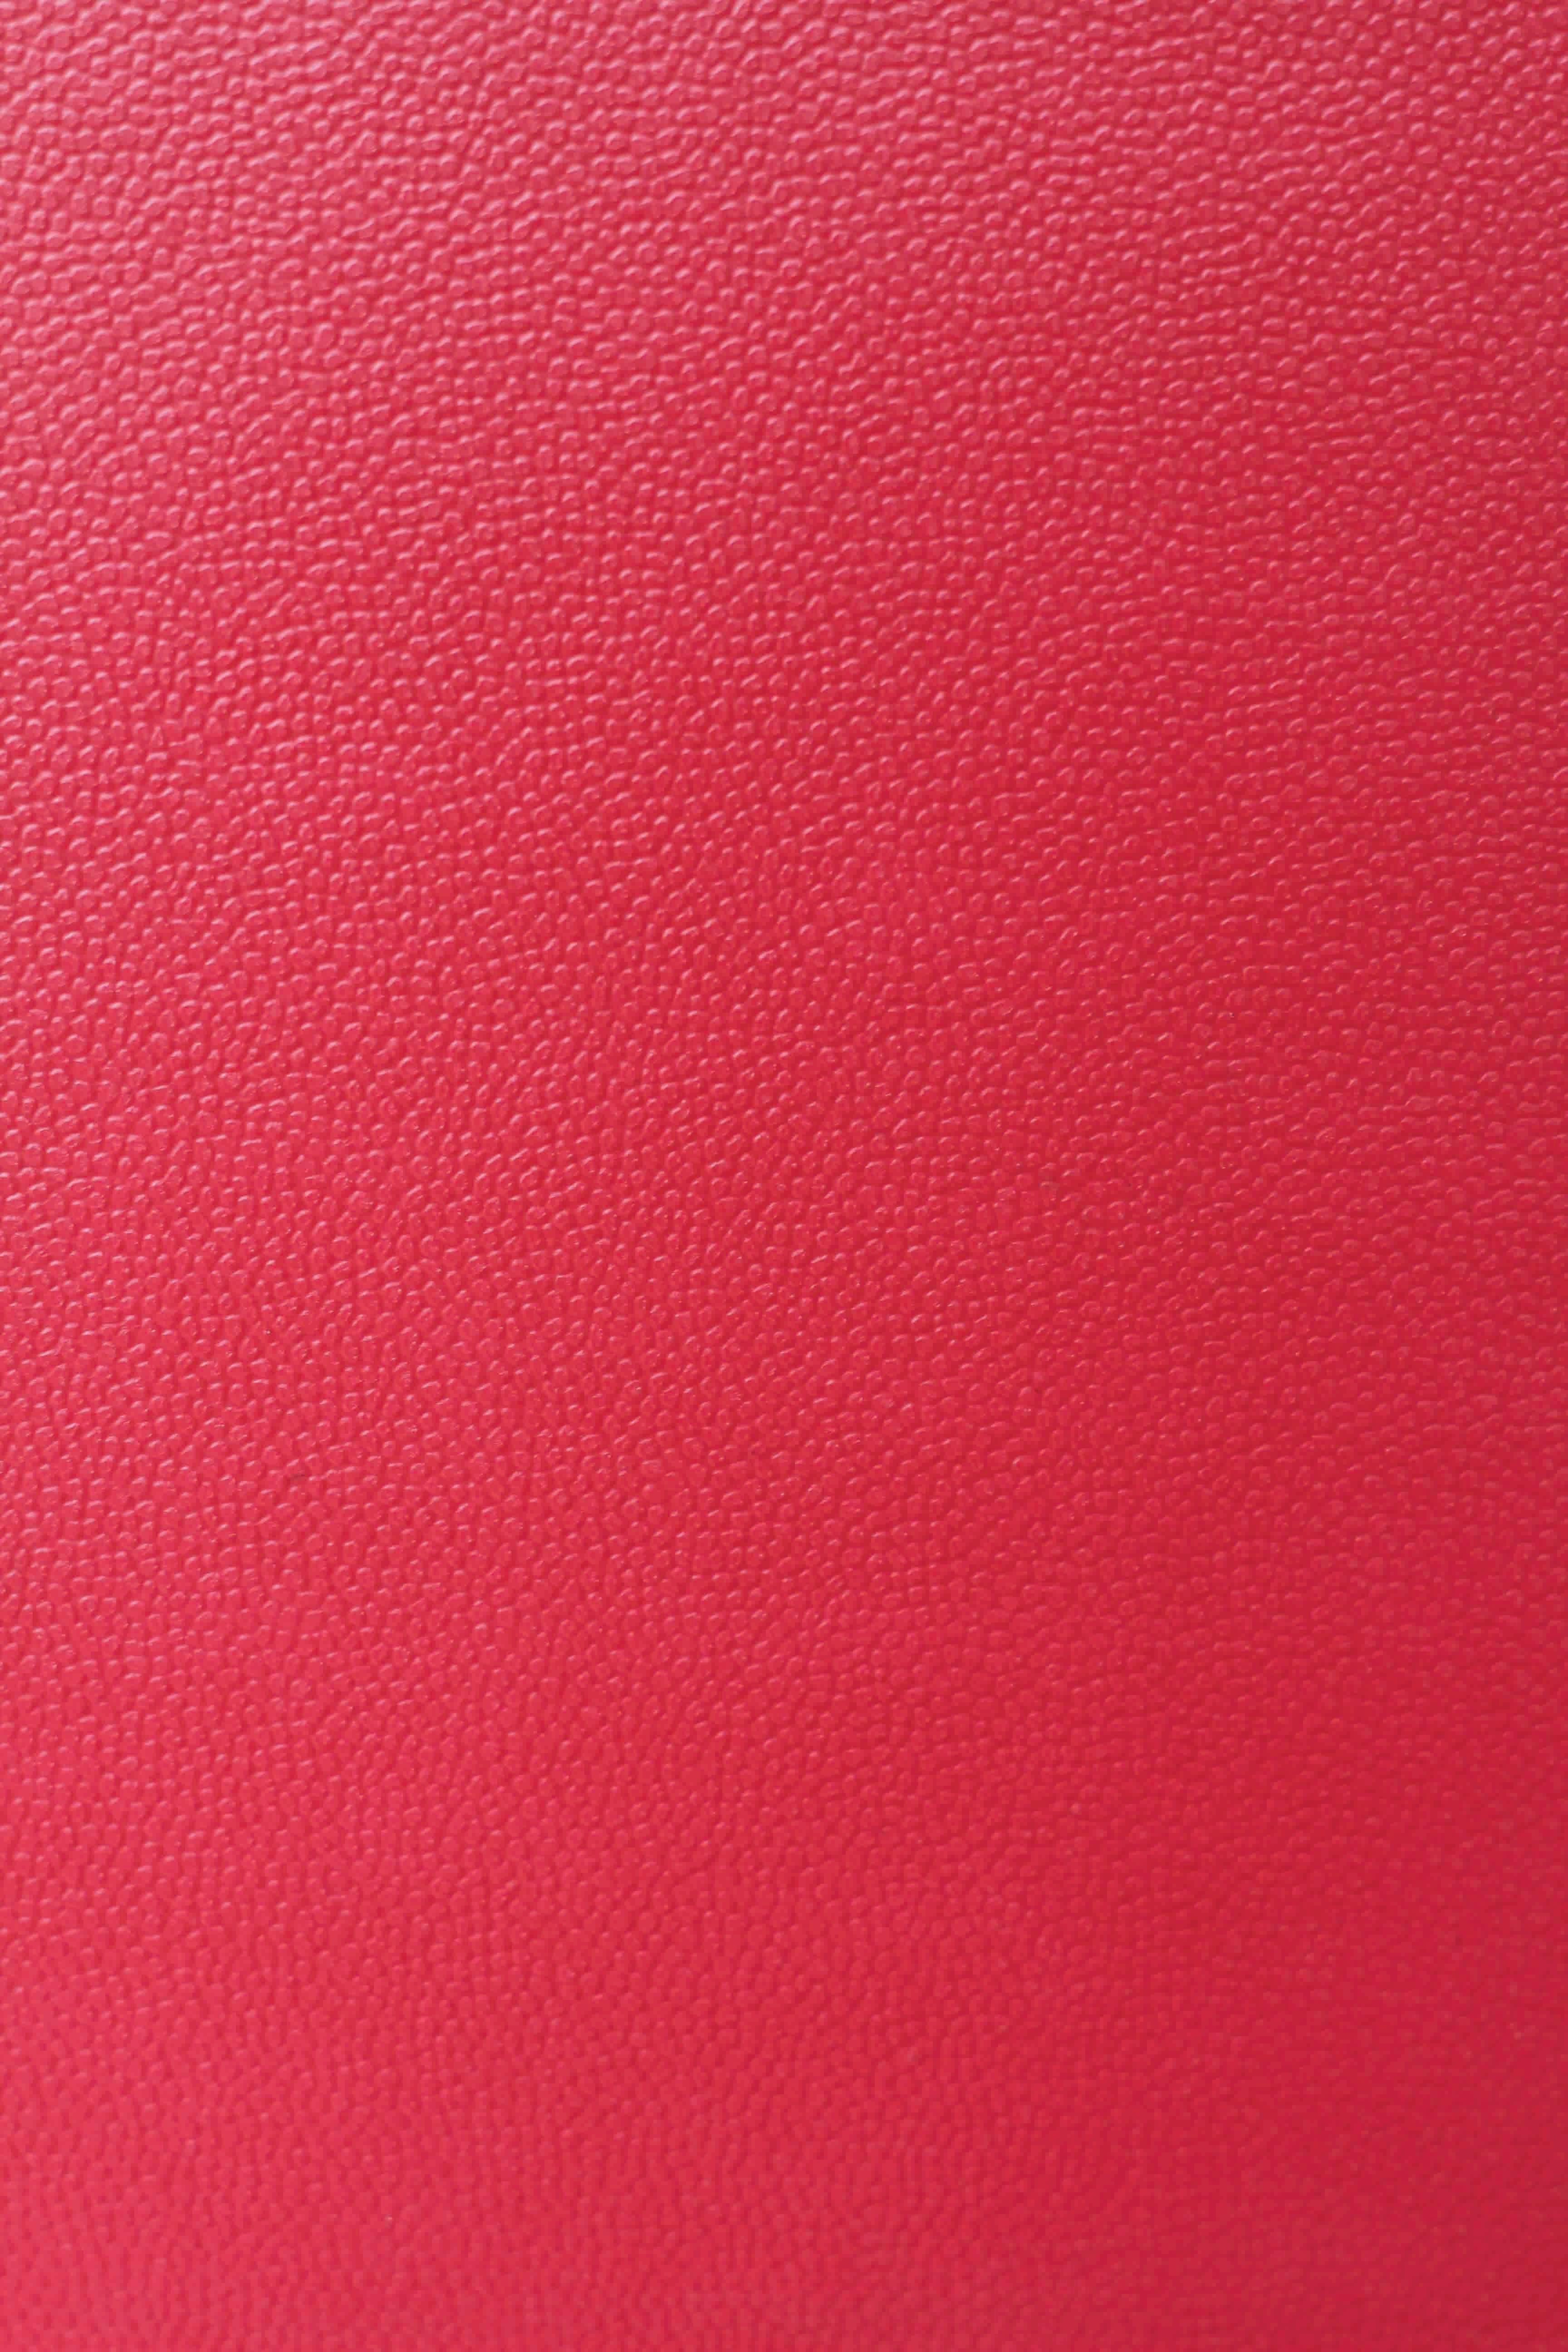 pvc flooring for school -    pastel cherry